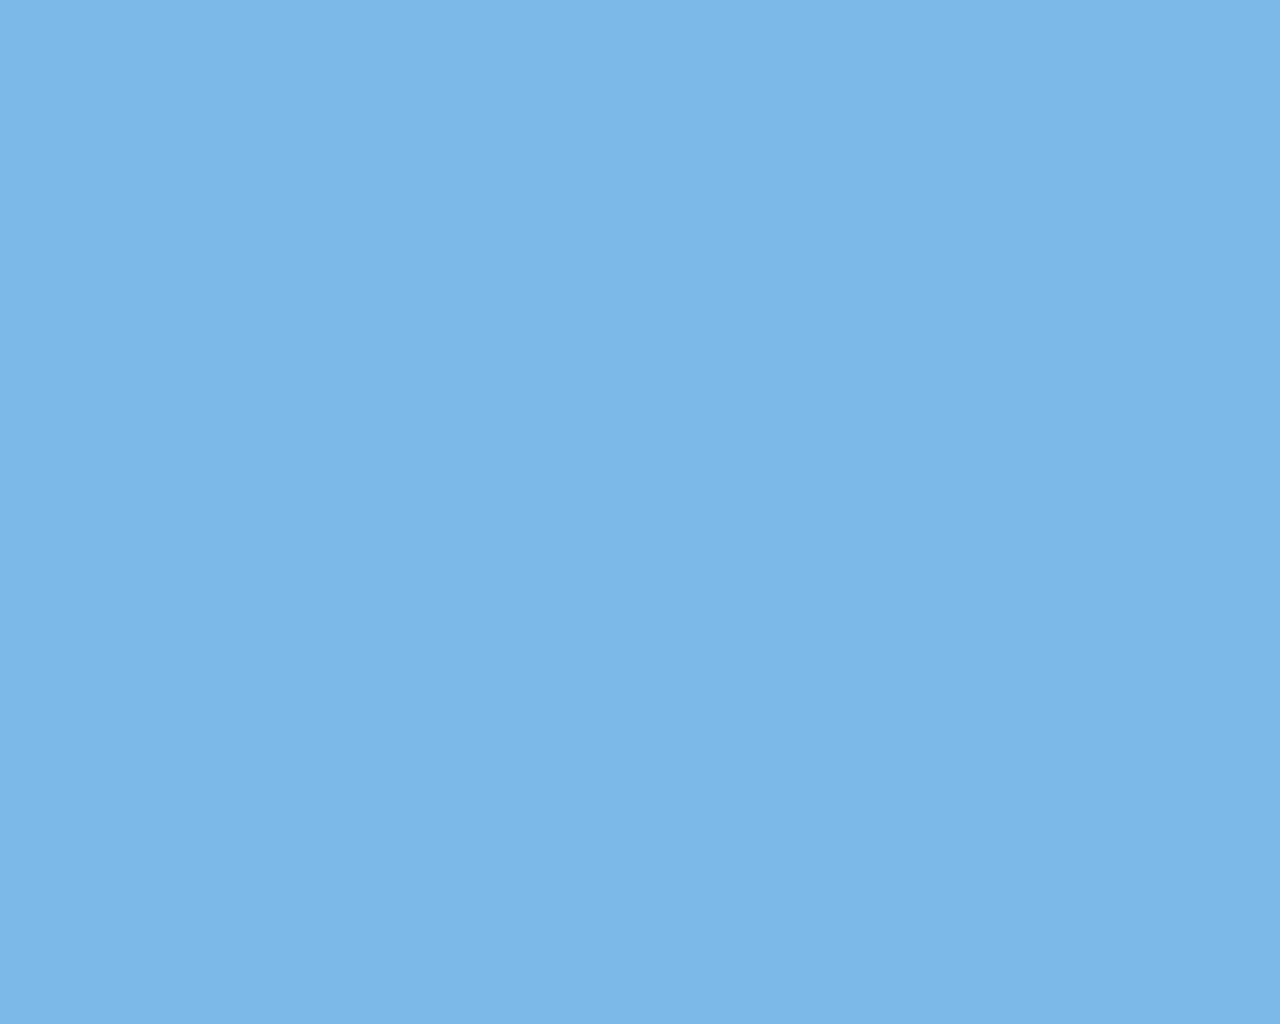 1280x1024 Aero Solid Color Background